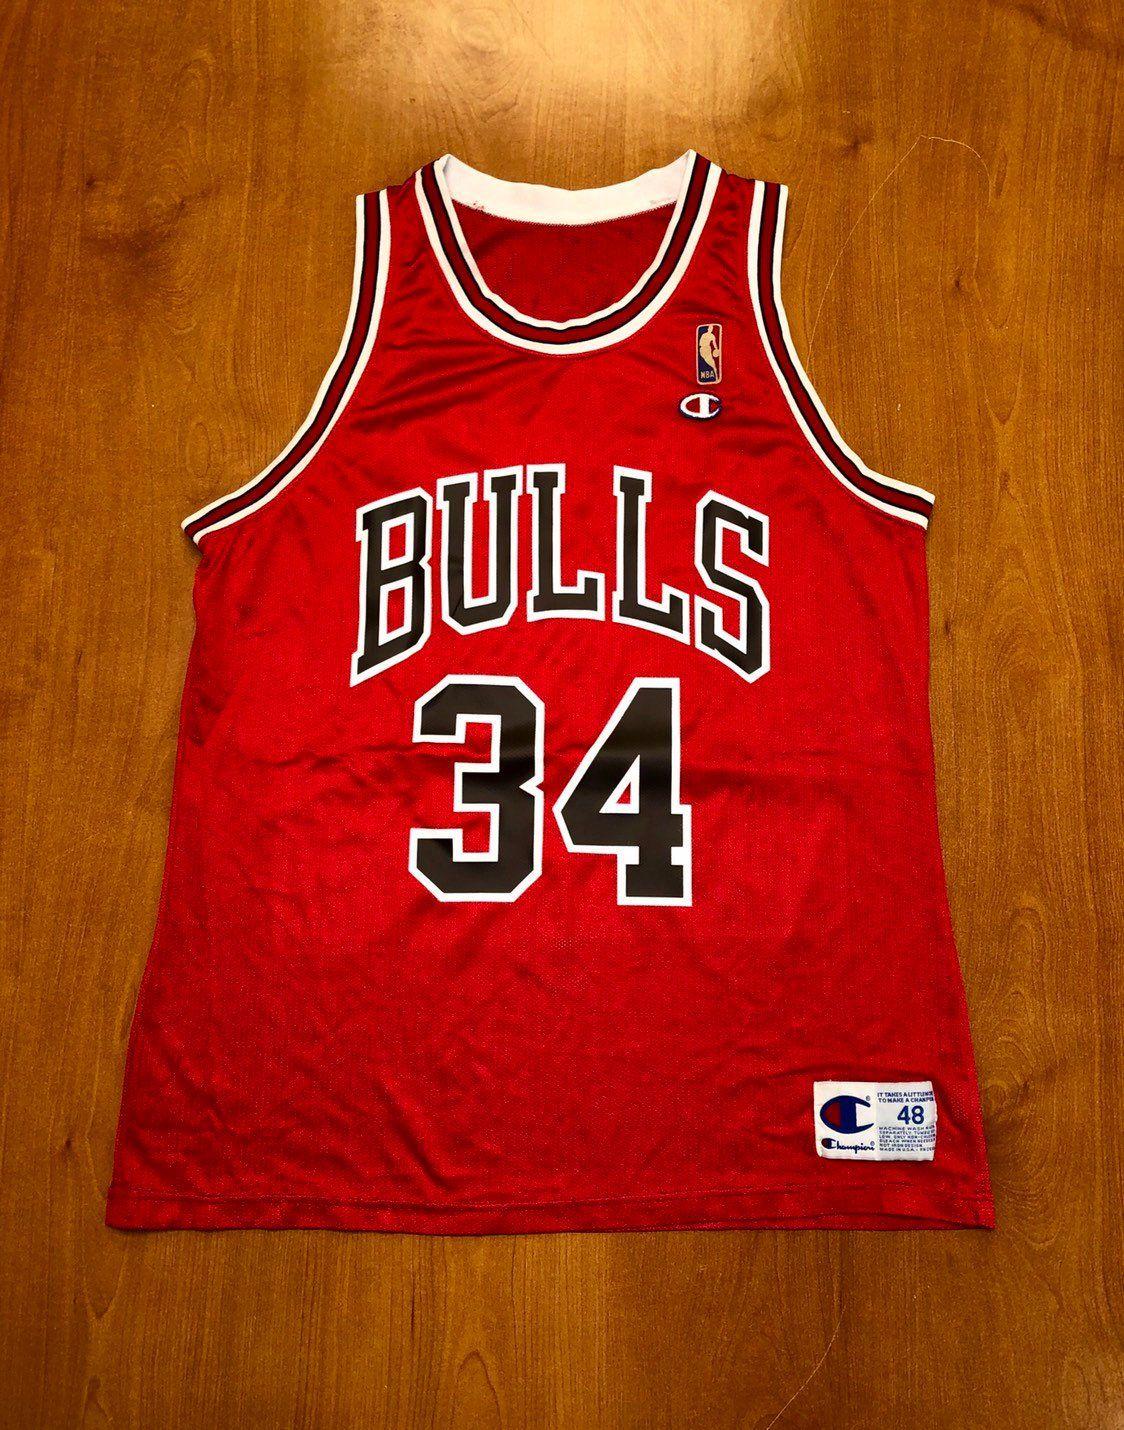 Vintage 1994 Bill Wennington Chicago Bulls Champion Jersey Size 48 nba  finals hat shirt scottie pippen michael jordan st.john s team canada by ... 27b114b59